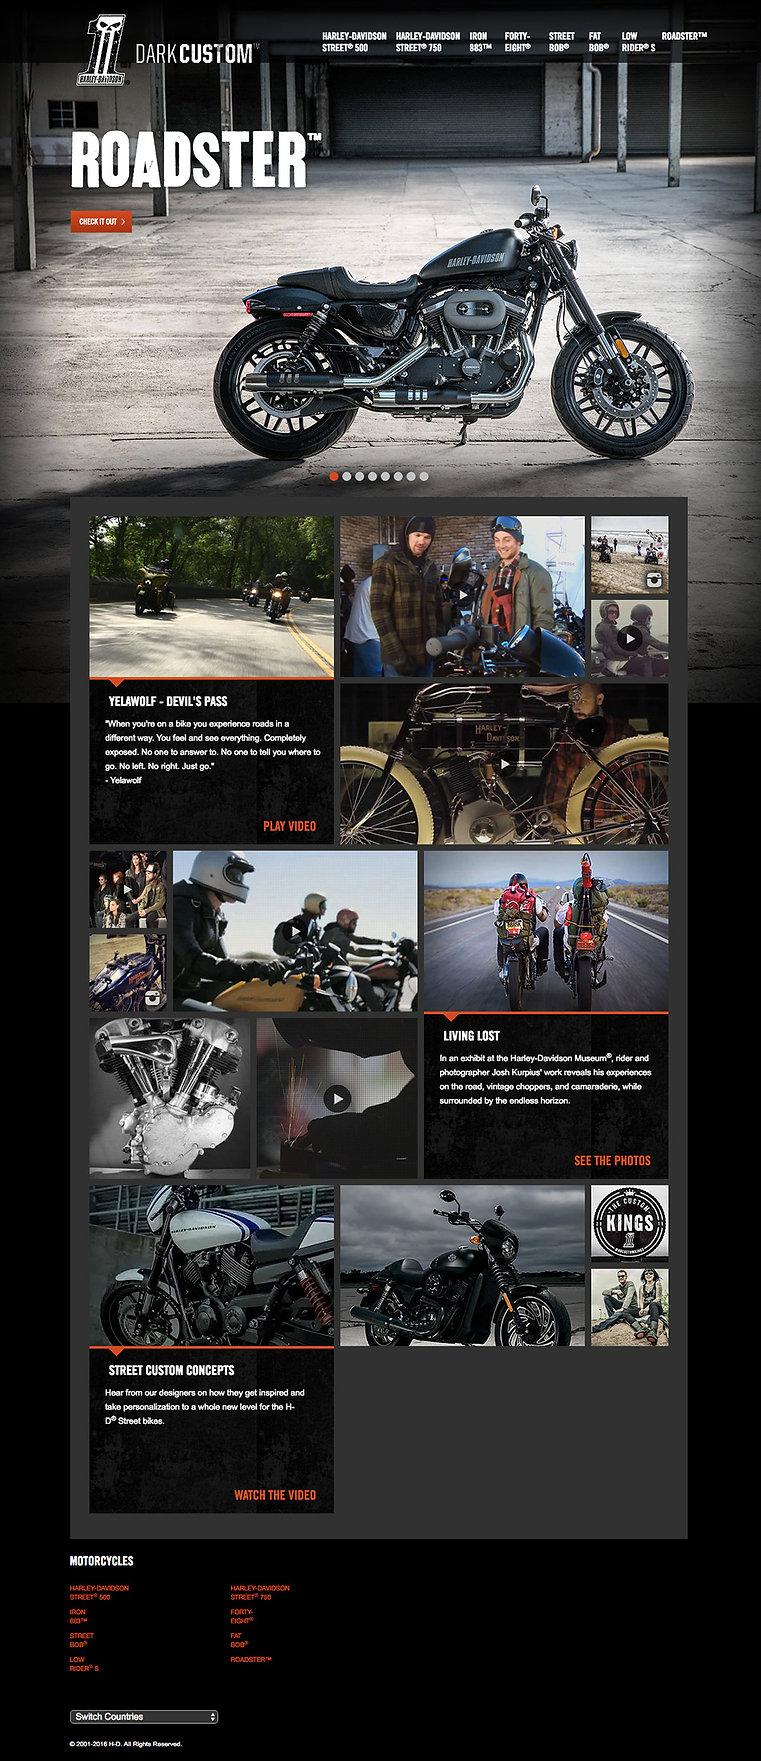 Harley_DarkCustom_full page.jpg